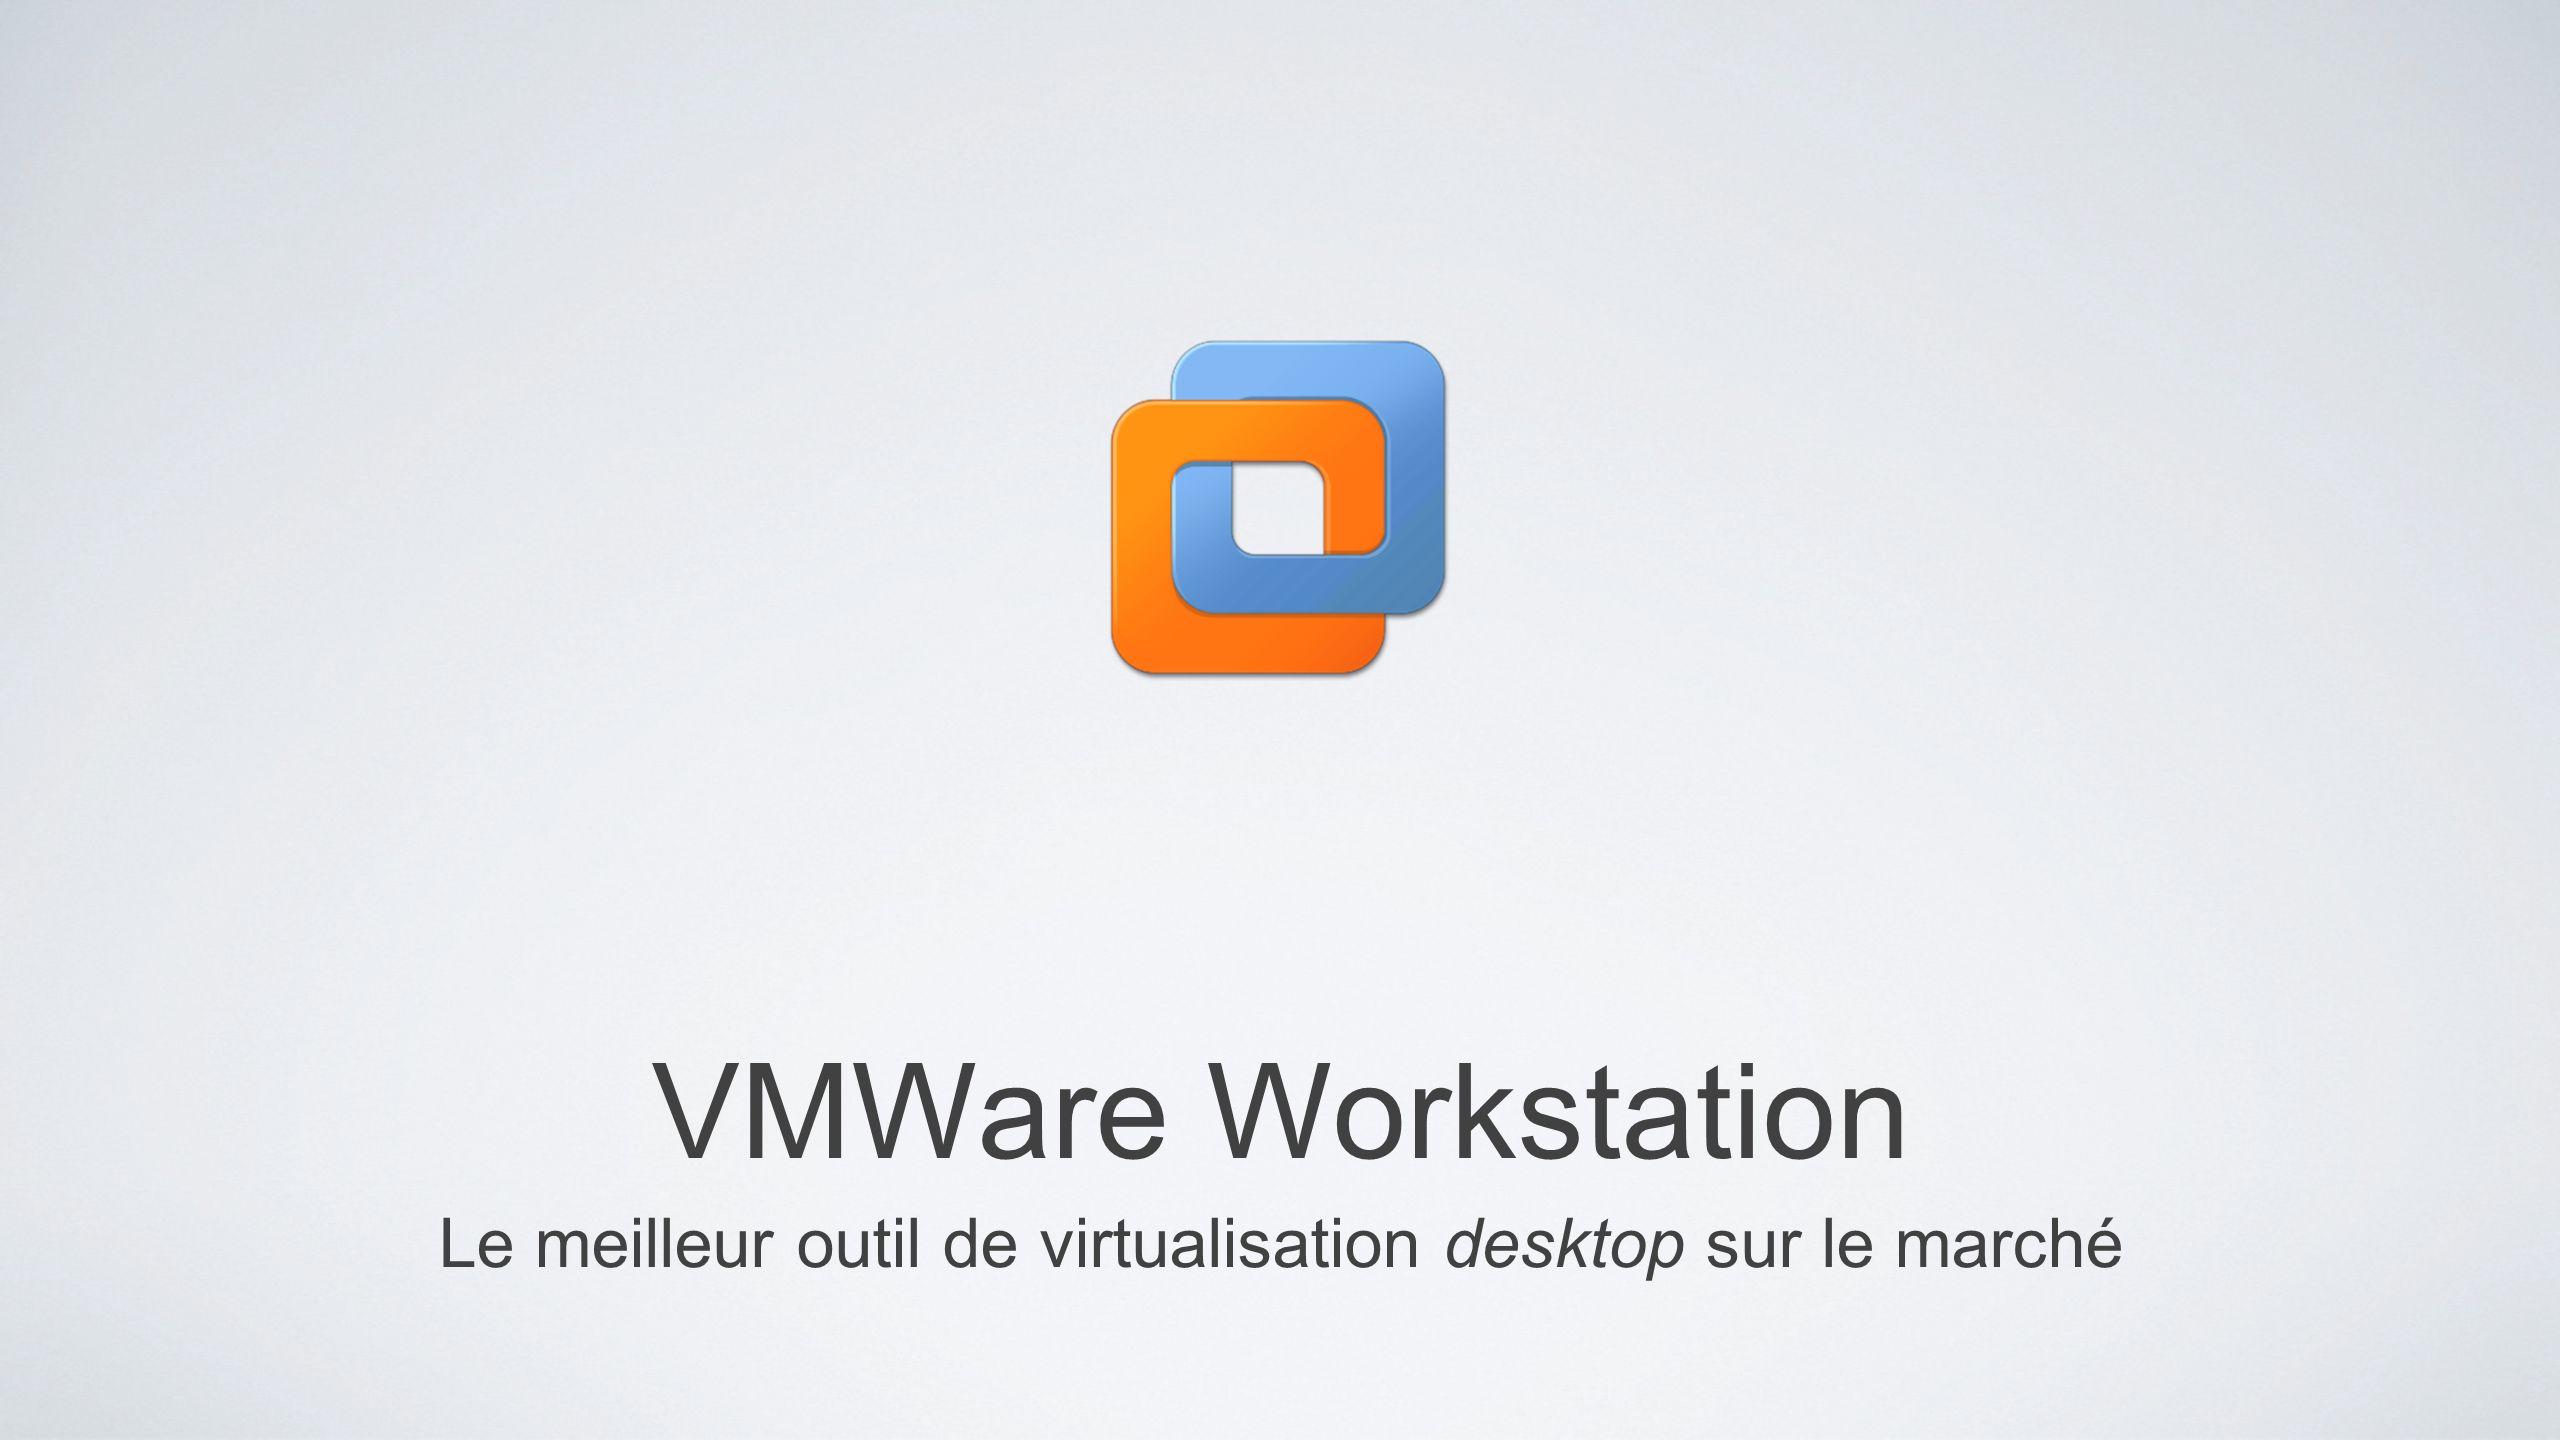 Création dune machine virtuelle Création dune machine virtuelle avec VMware Workstation